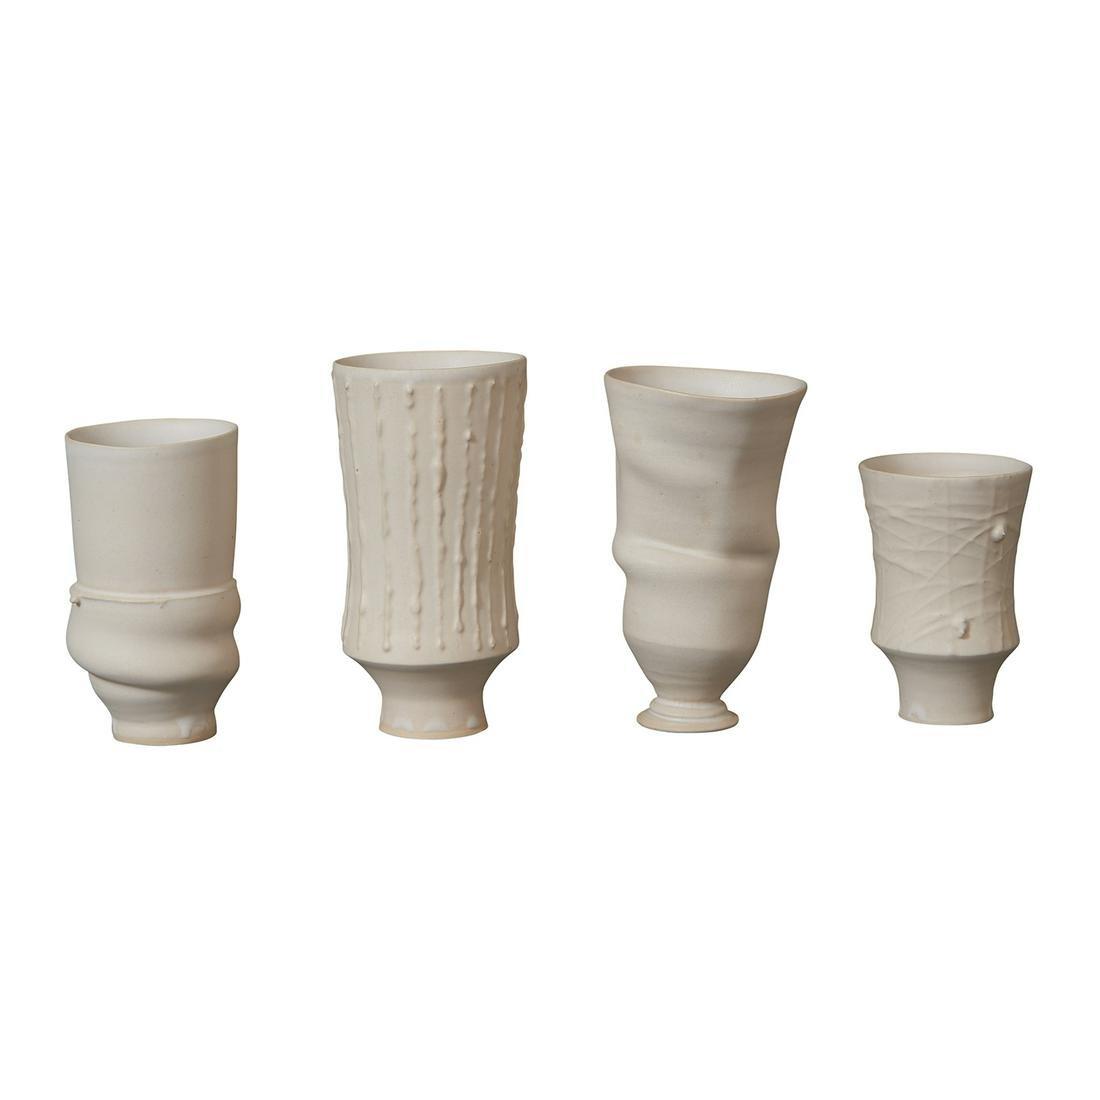 Studio Pottery four pieces